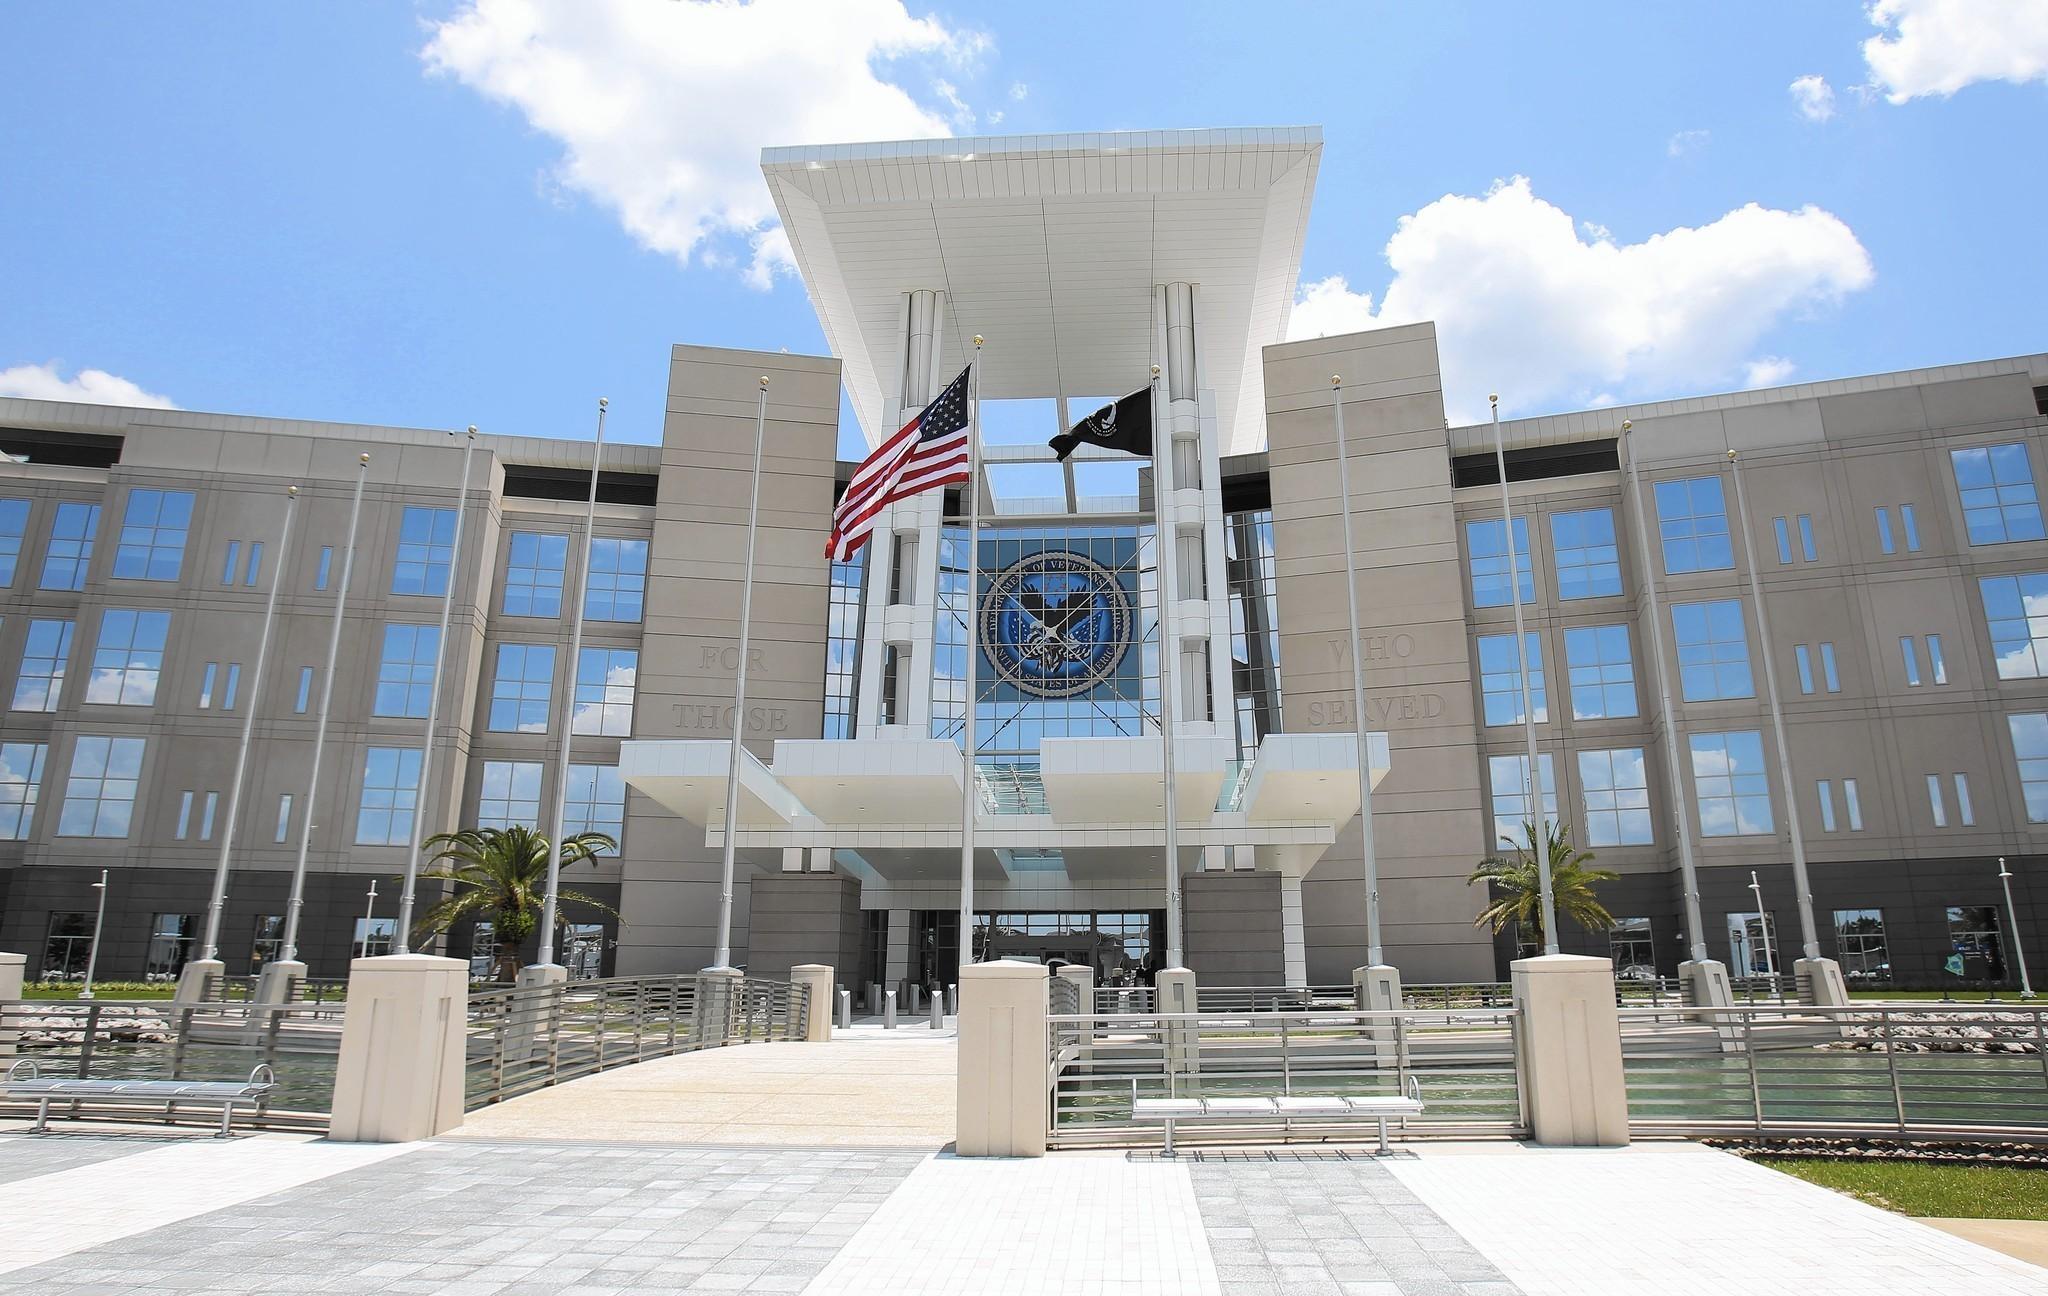 Orlando VA construction problems raise questions - Orlando Sentinel